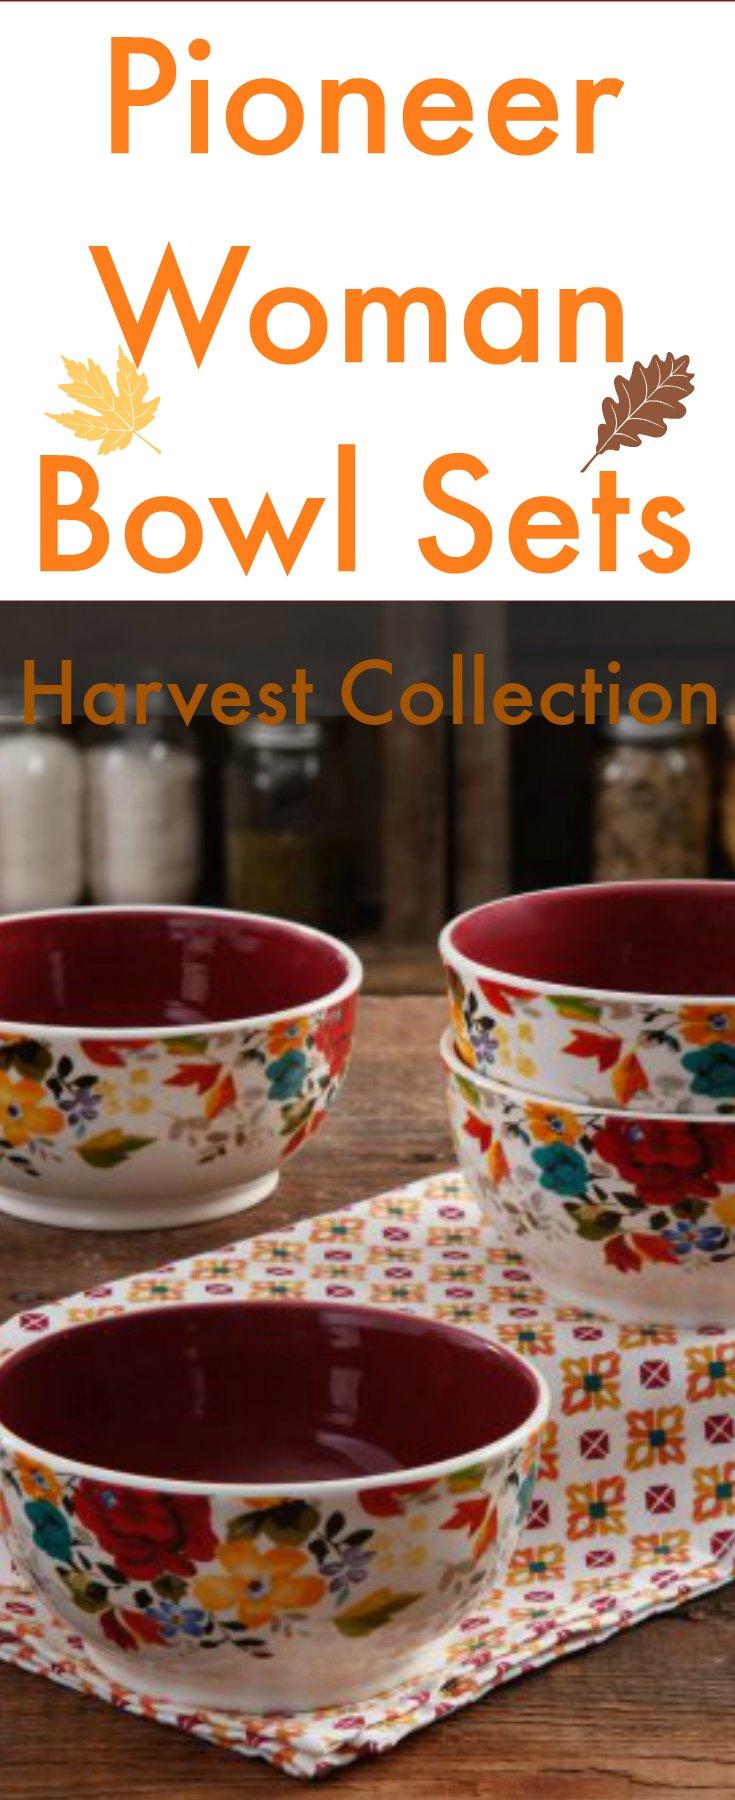 The Pioneer Woman Bowl Set